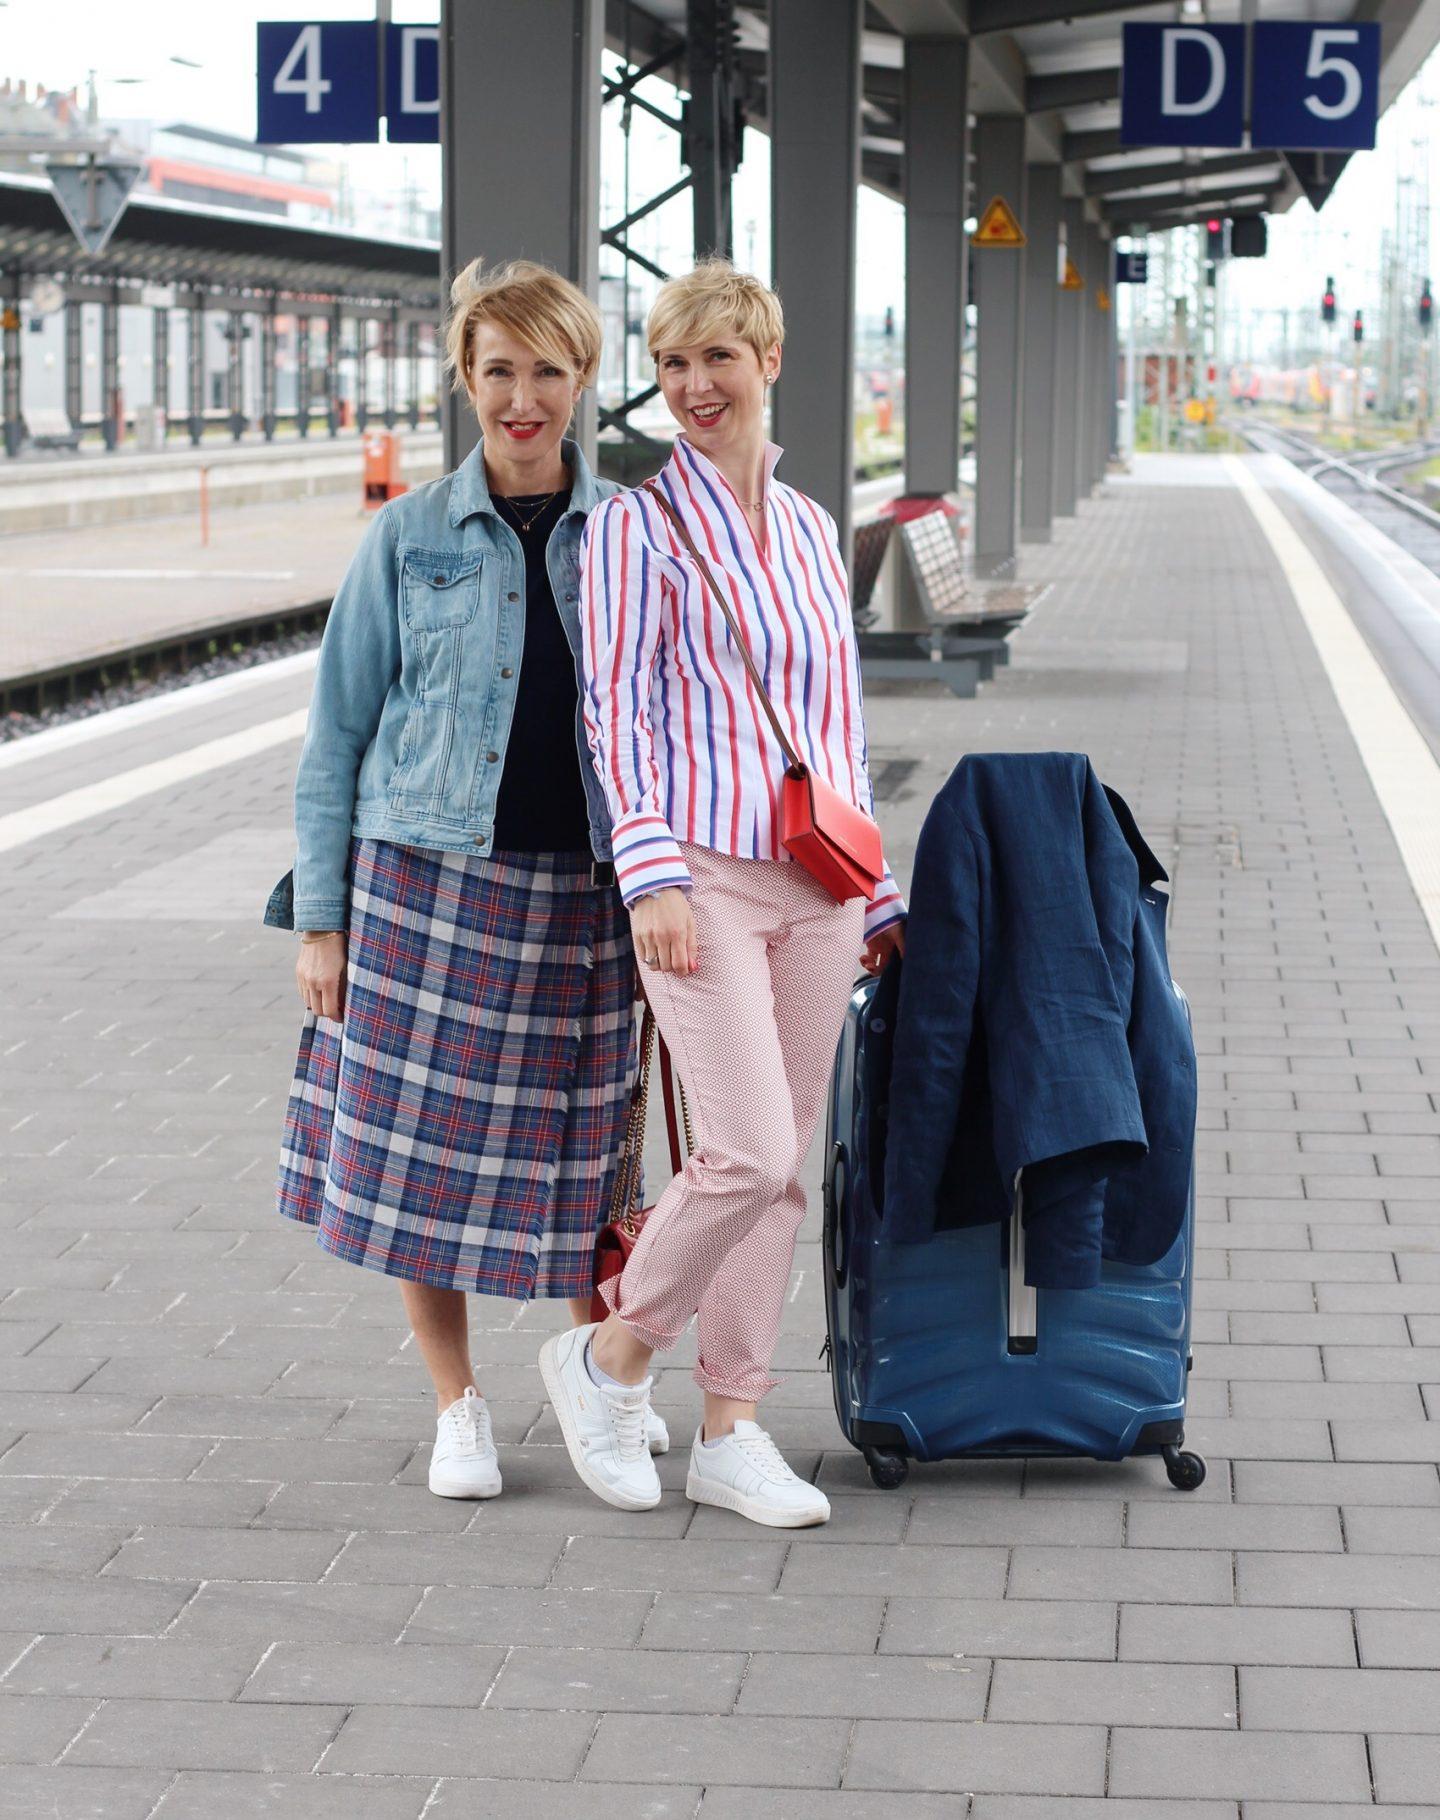 glamupyourlifestyle jeansjacke jeansjacke-reisen reisegarderobe reise-outfit urlaubsgarderobe ü-4ß-blog ü-50-blog ue-40-blog